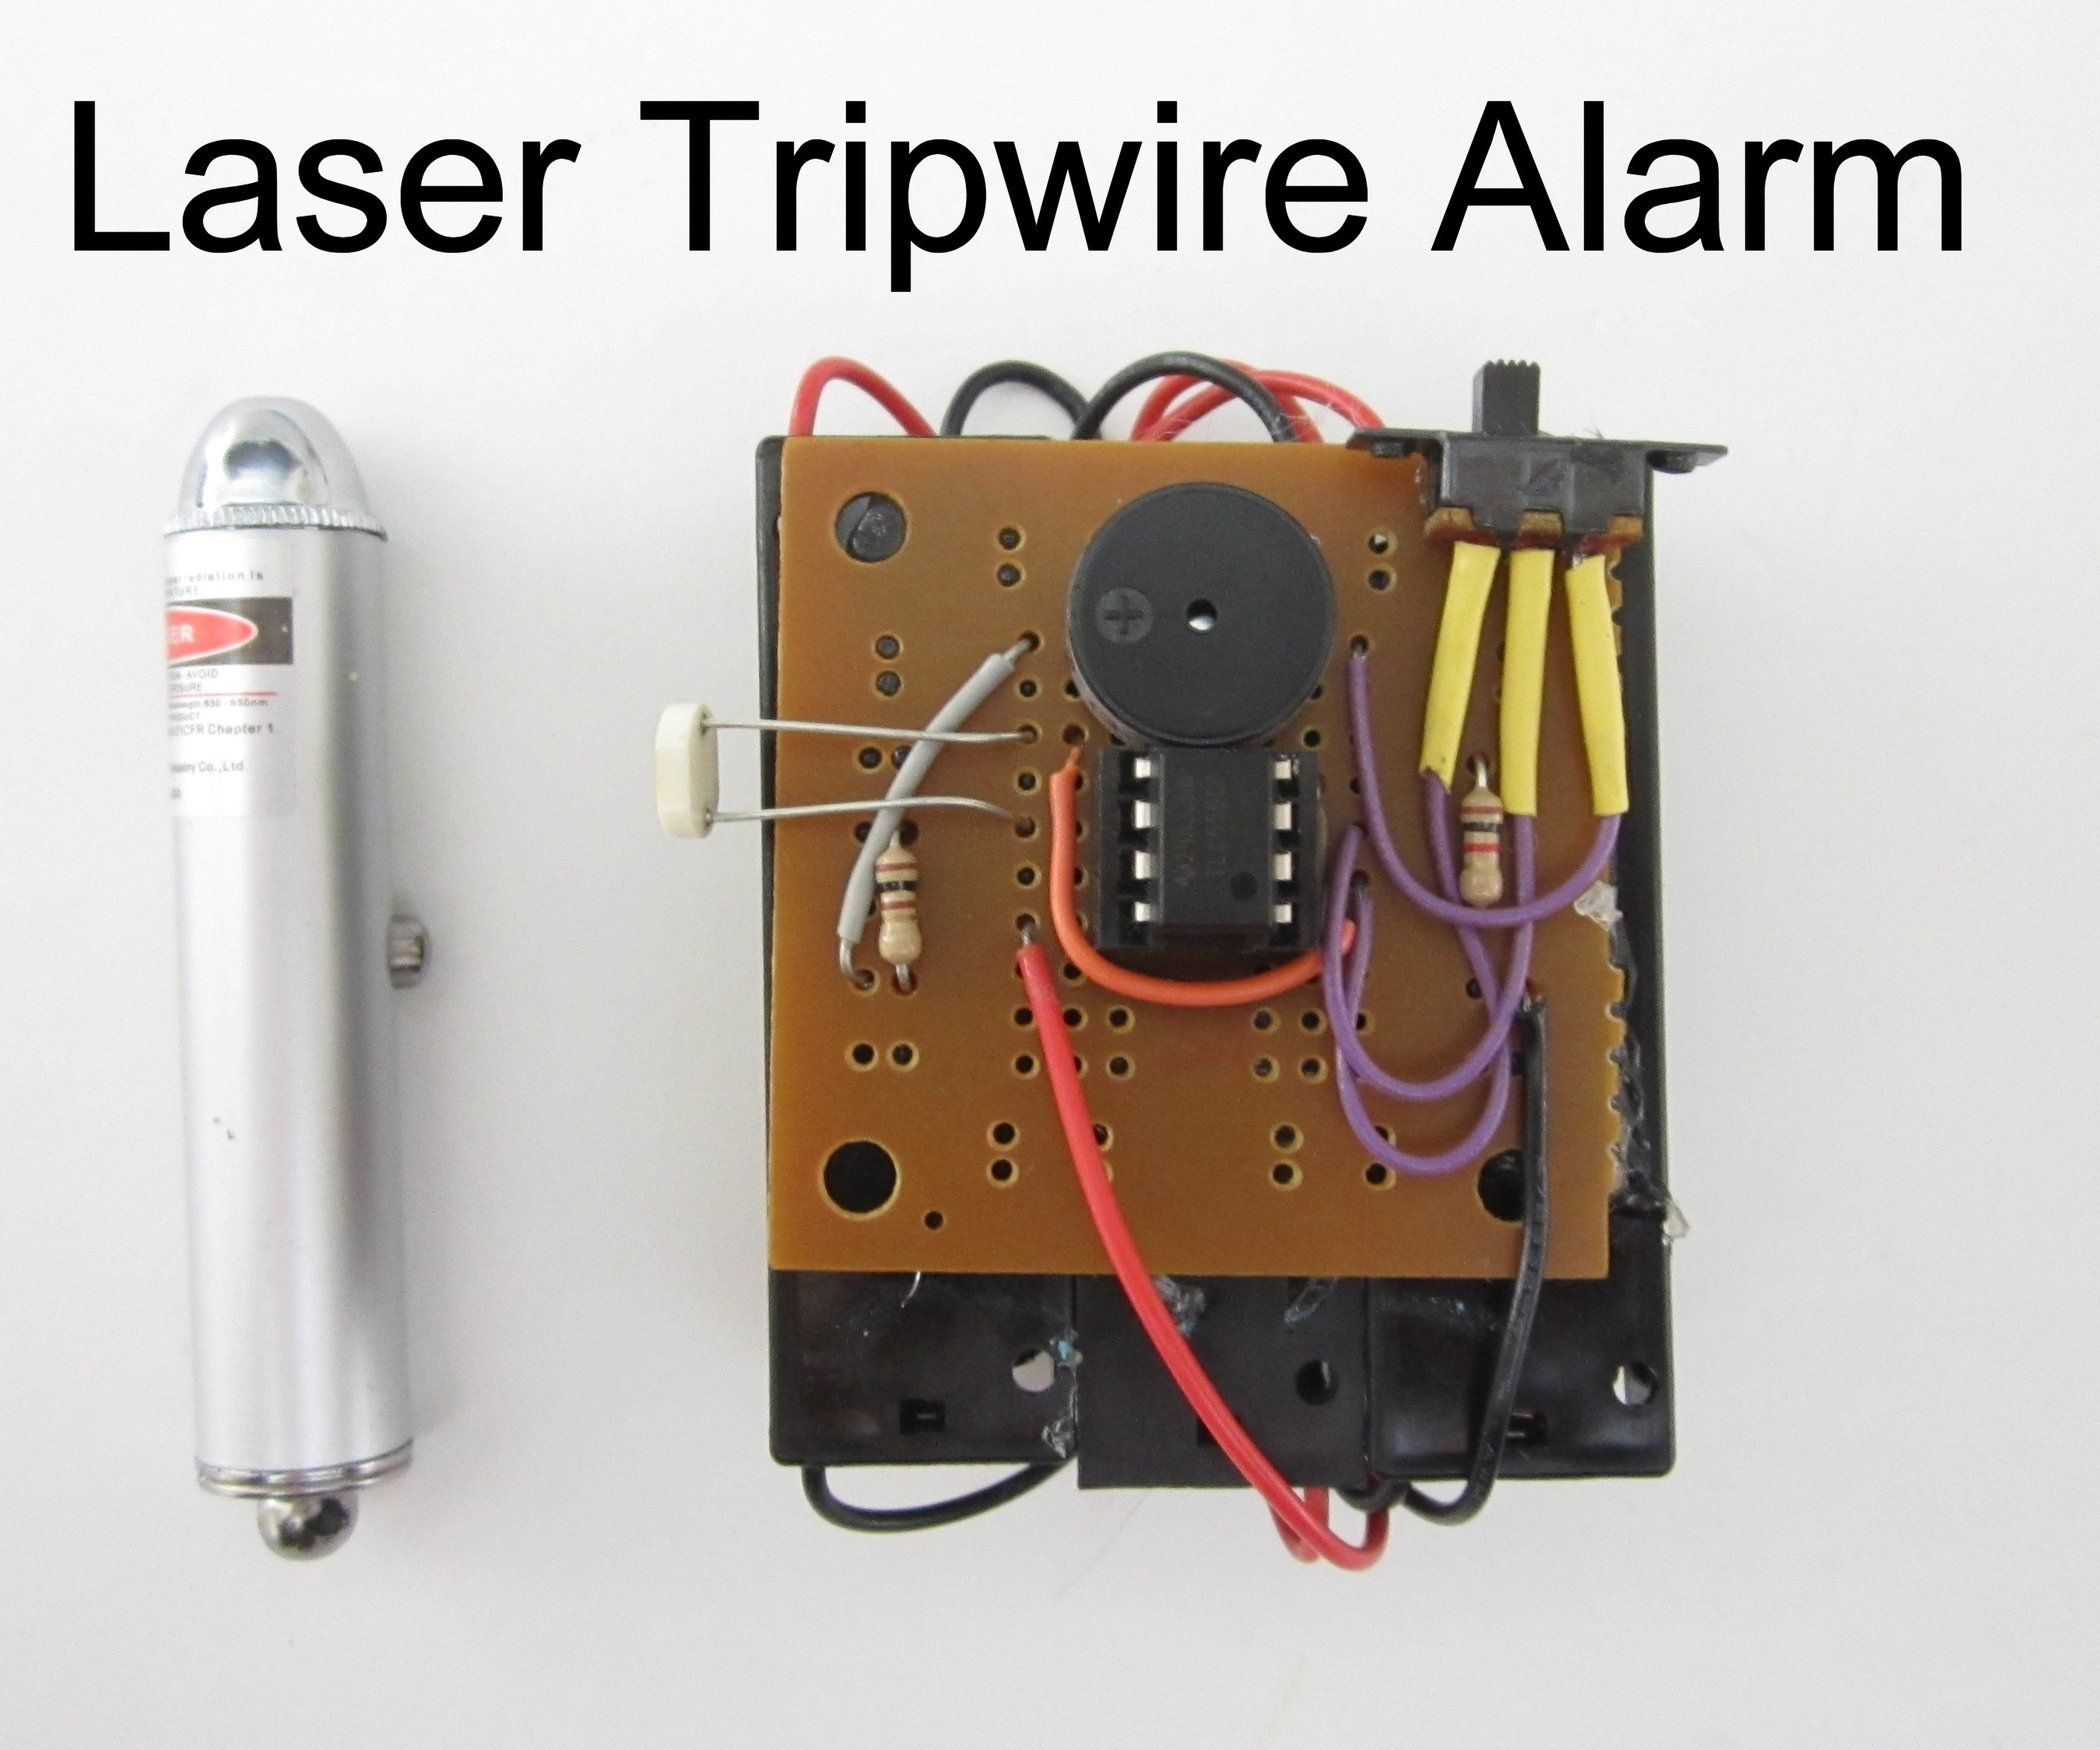 Laser Tripwire Alarm Laser Tripwire Diy Security Electronics Projects Diy